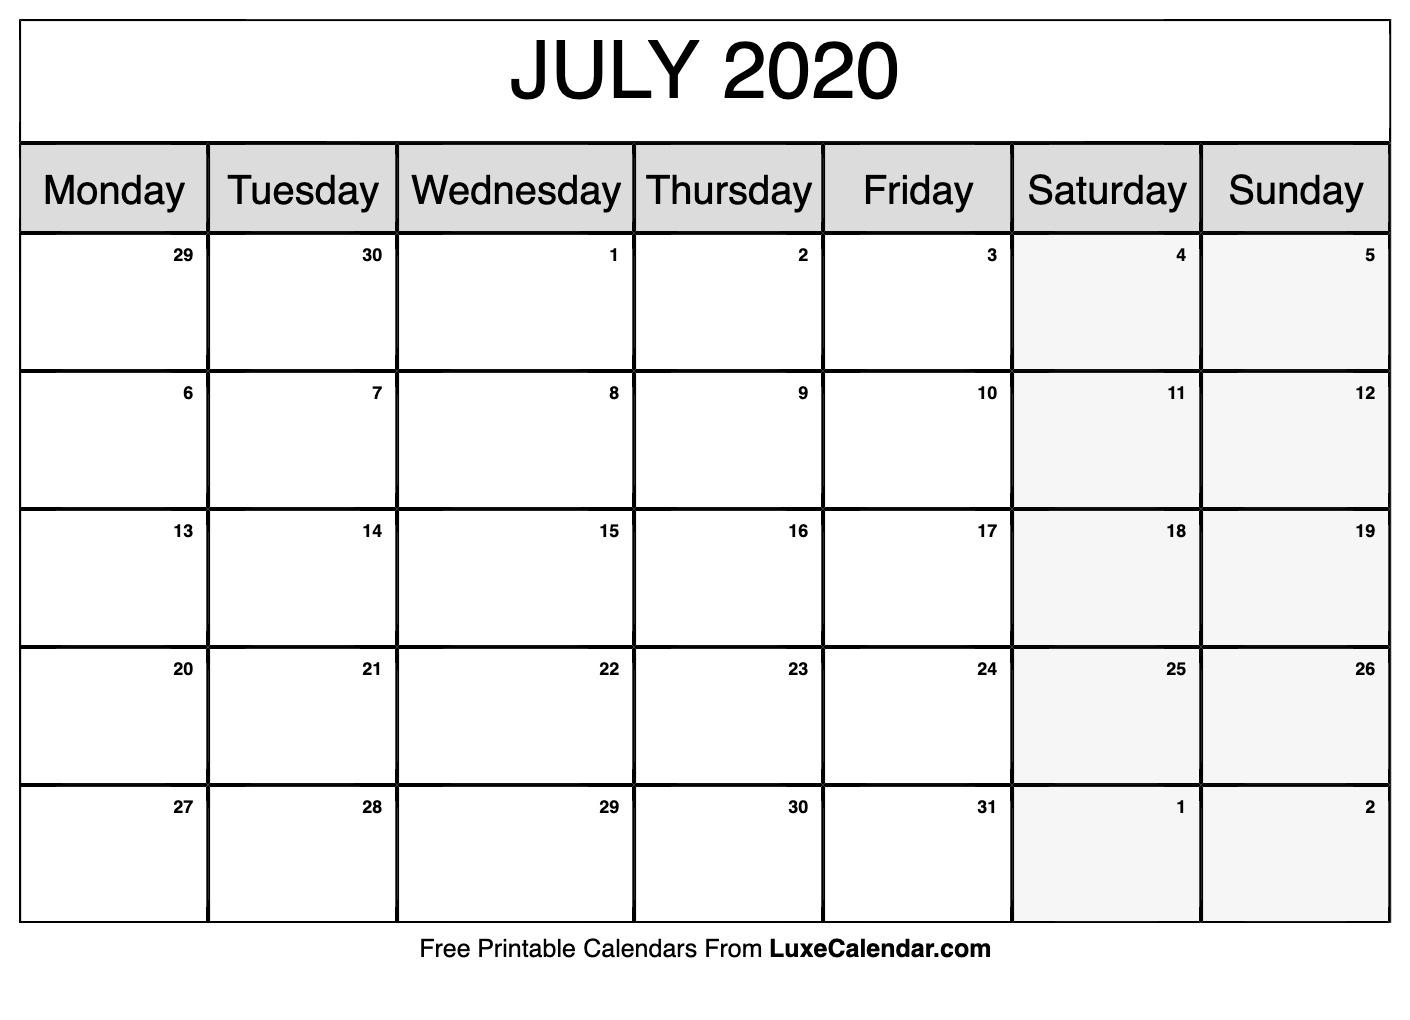 July 2020 Printable Calendar PDF